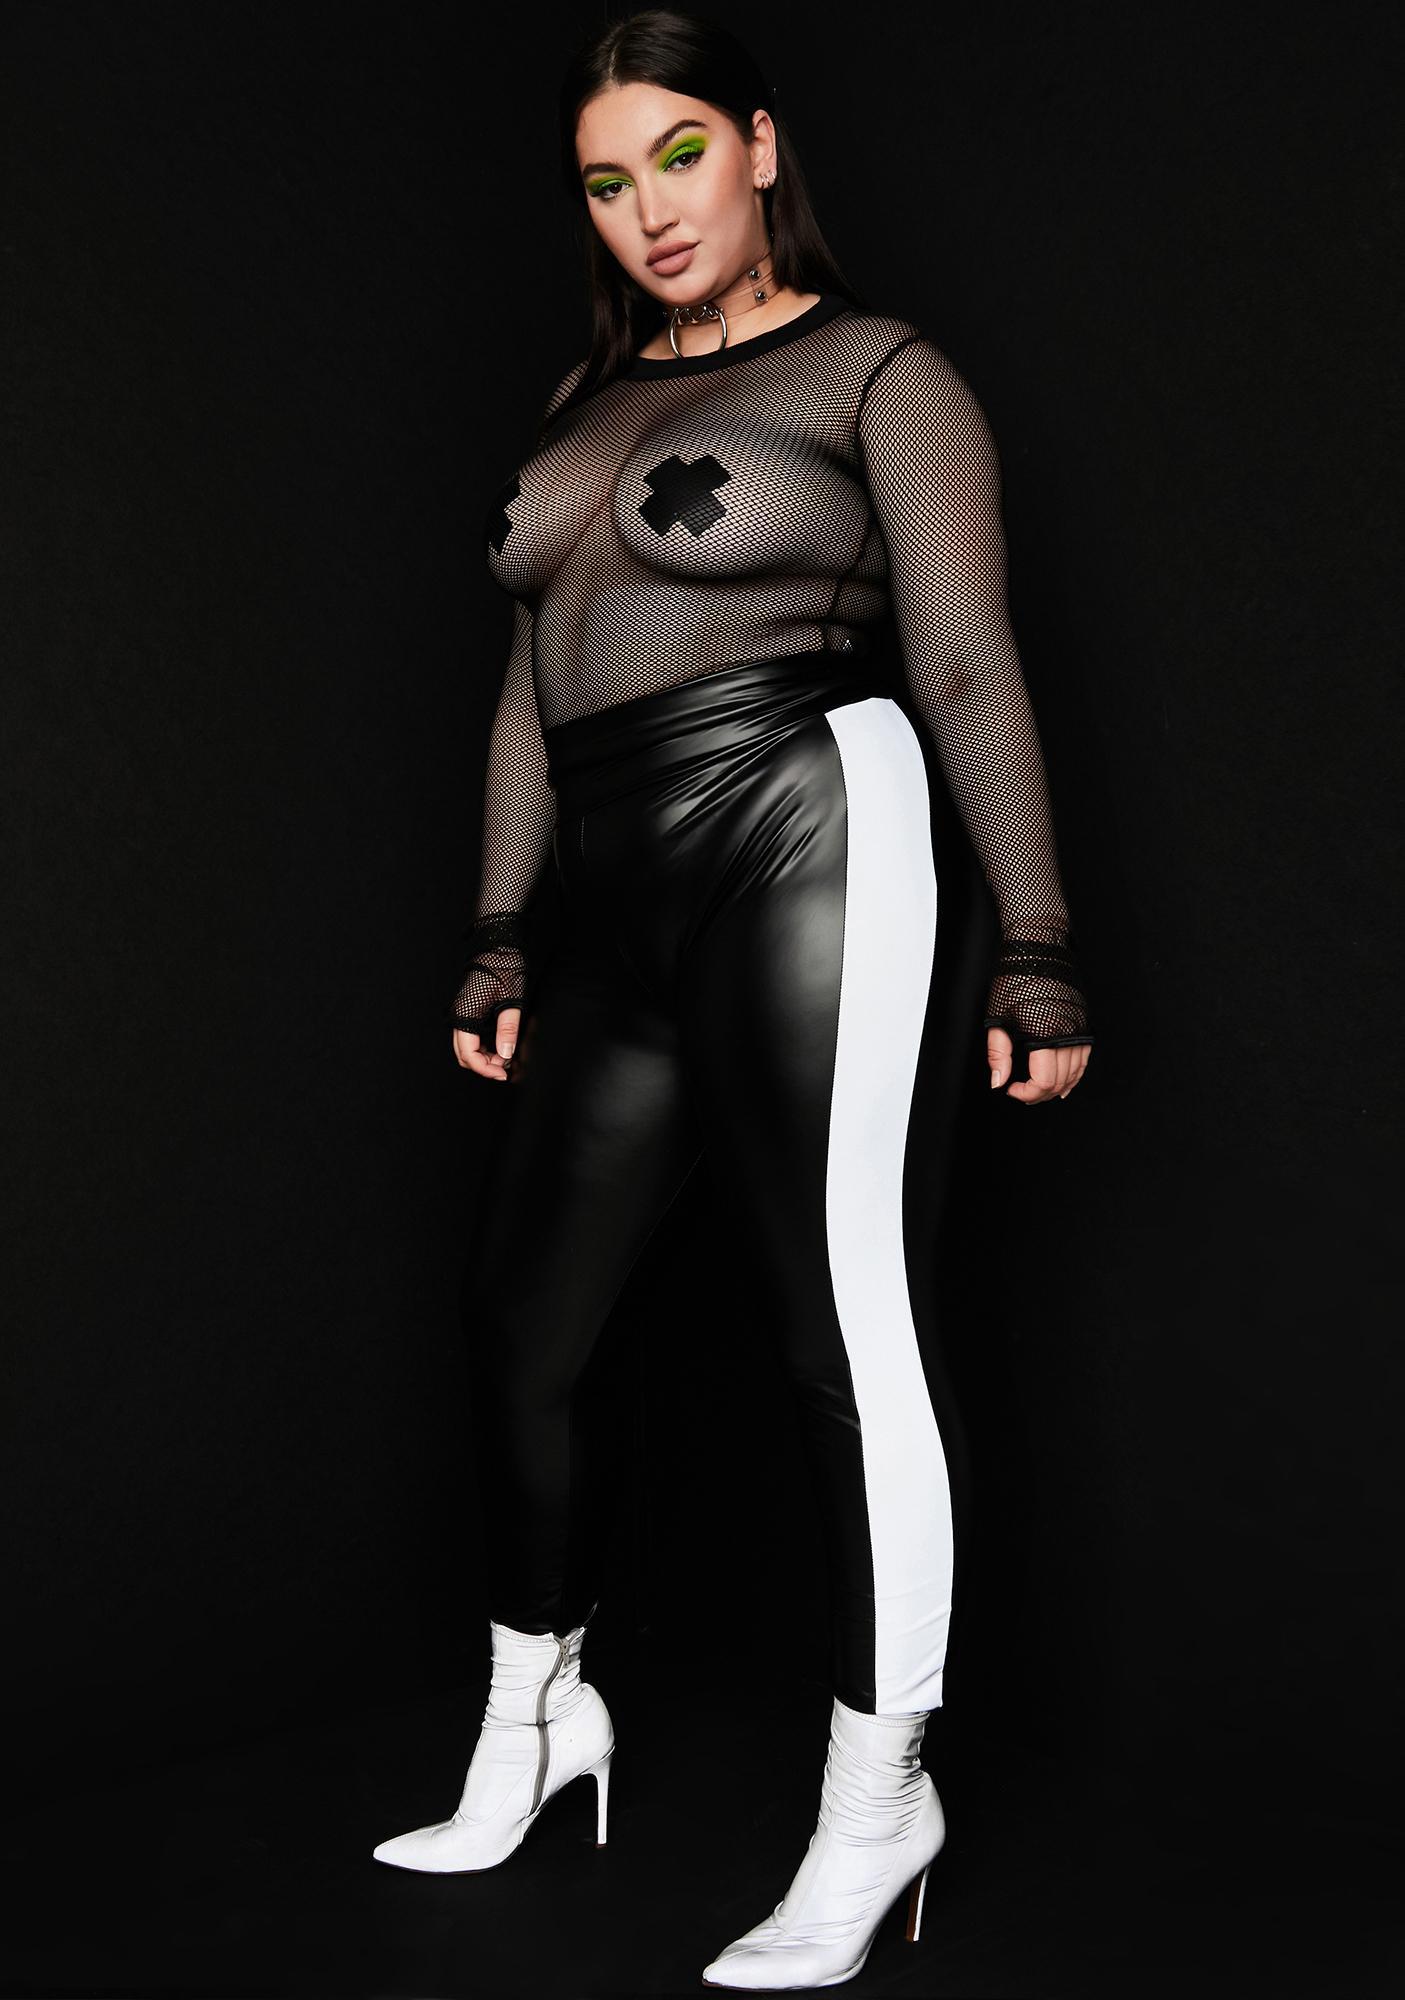 Lux Slick Fusion Reflective Leggings